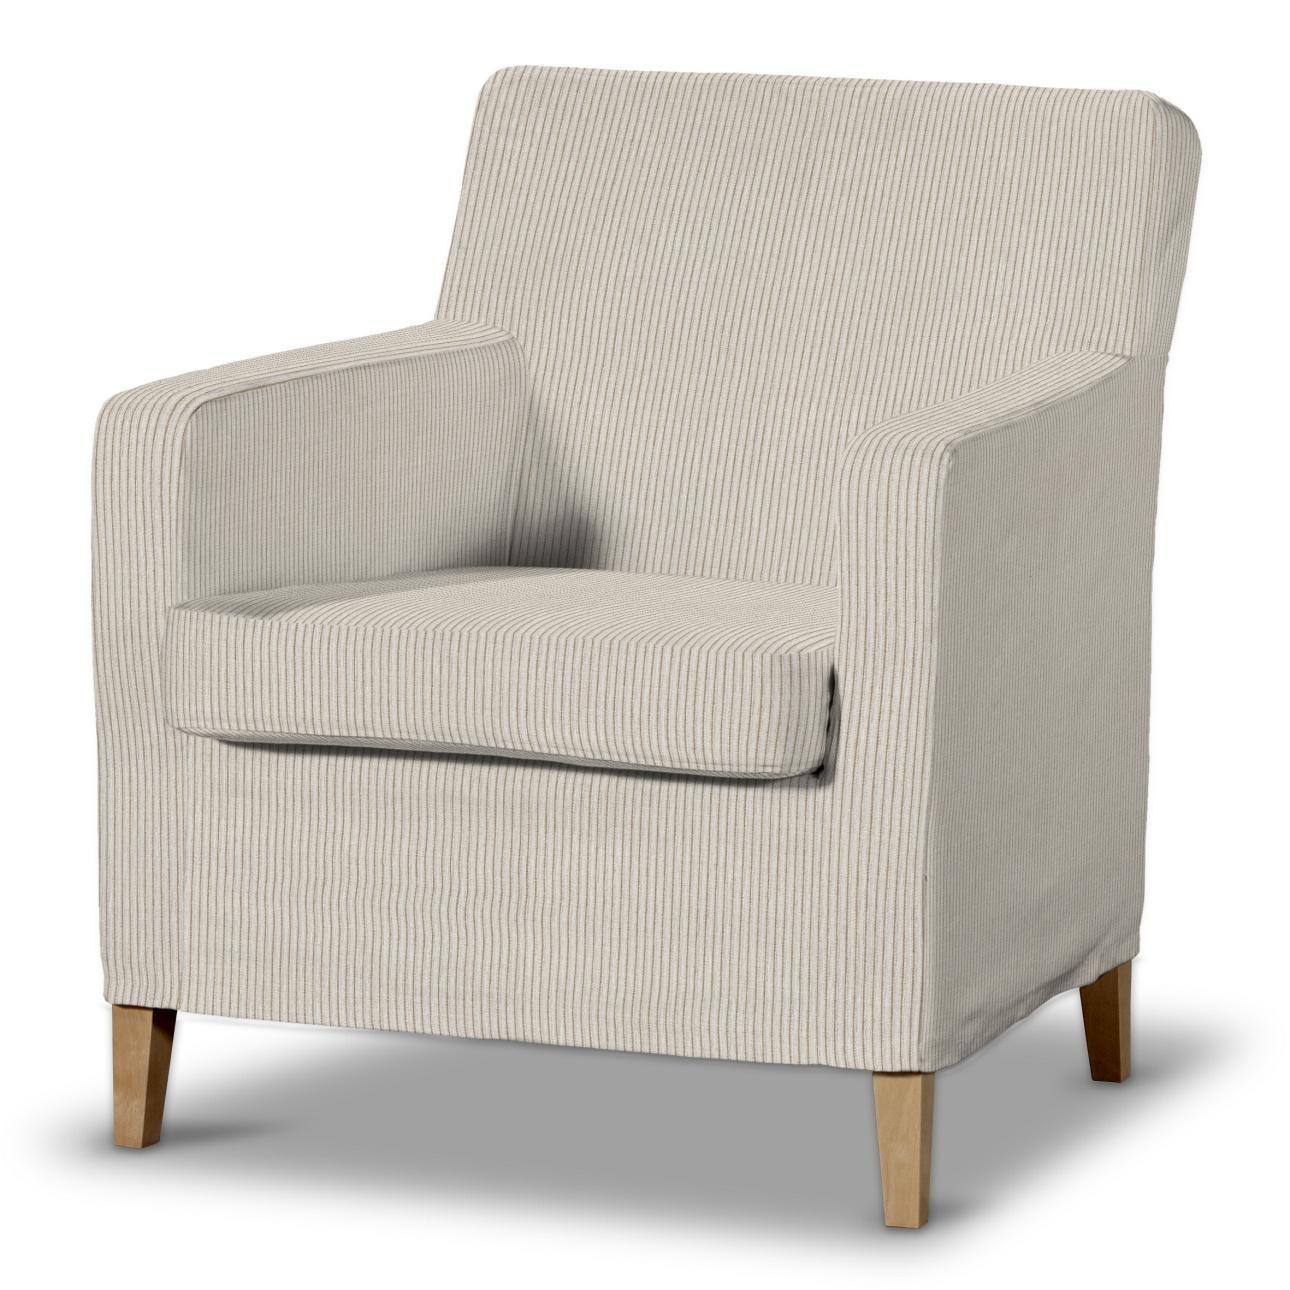 Ohrensessel Schaukelstuhl Sessel Möbel Vintage Ledersessel